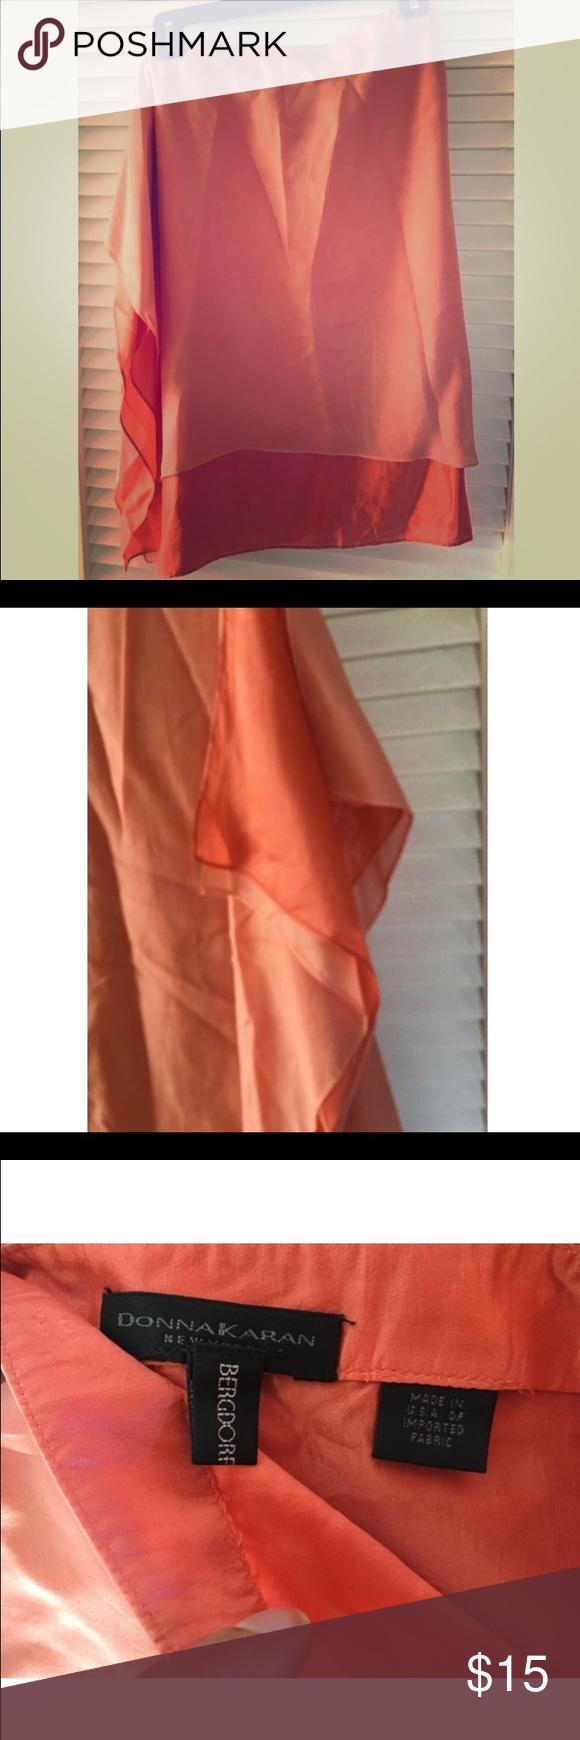 "☀️SALE☀️DKNY flowing Silk Skirt, Peach - xs A gorgeous piece. 100% silk. 2 layers, 2 shades of peach. Side zipper makes it easy. Elegant, flowing skirt. 26"" waist, length - 2 DKNY Skirts Midi"